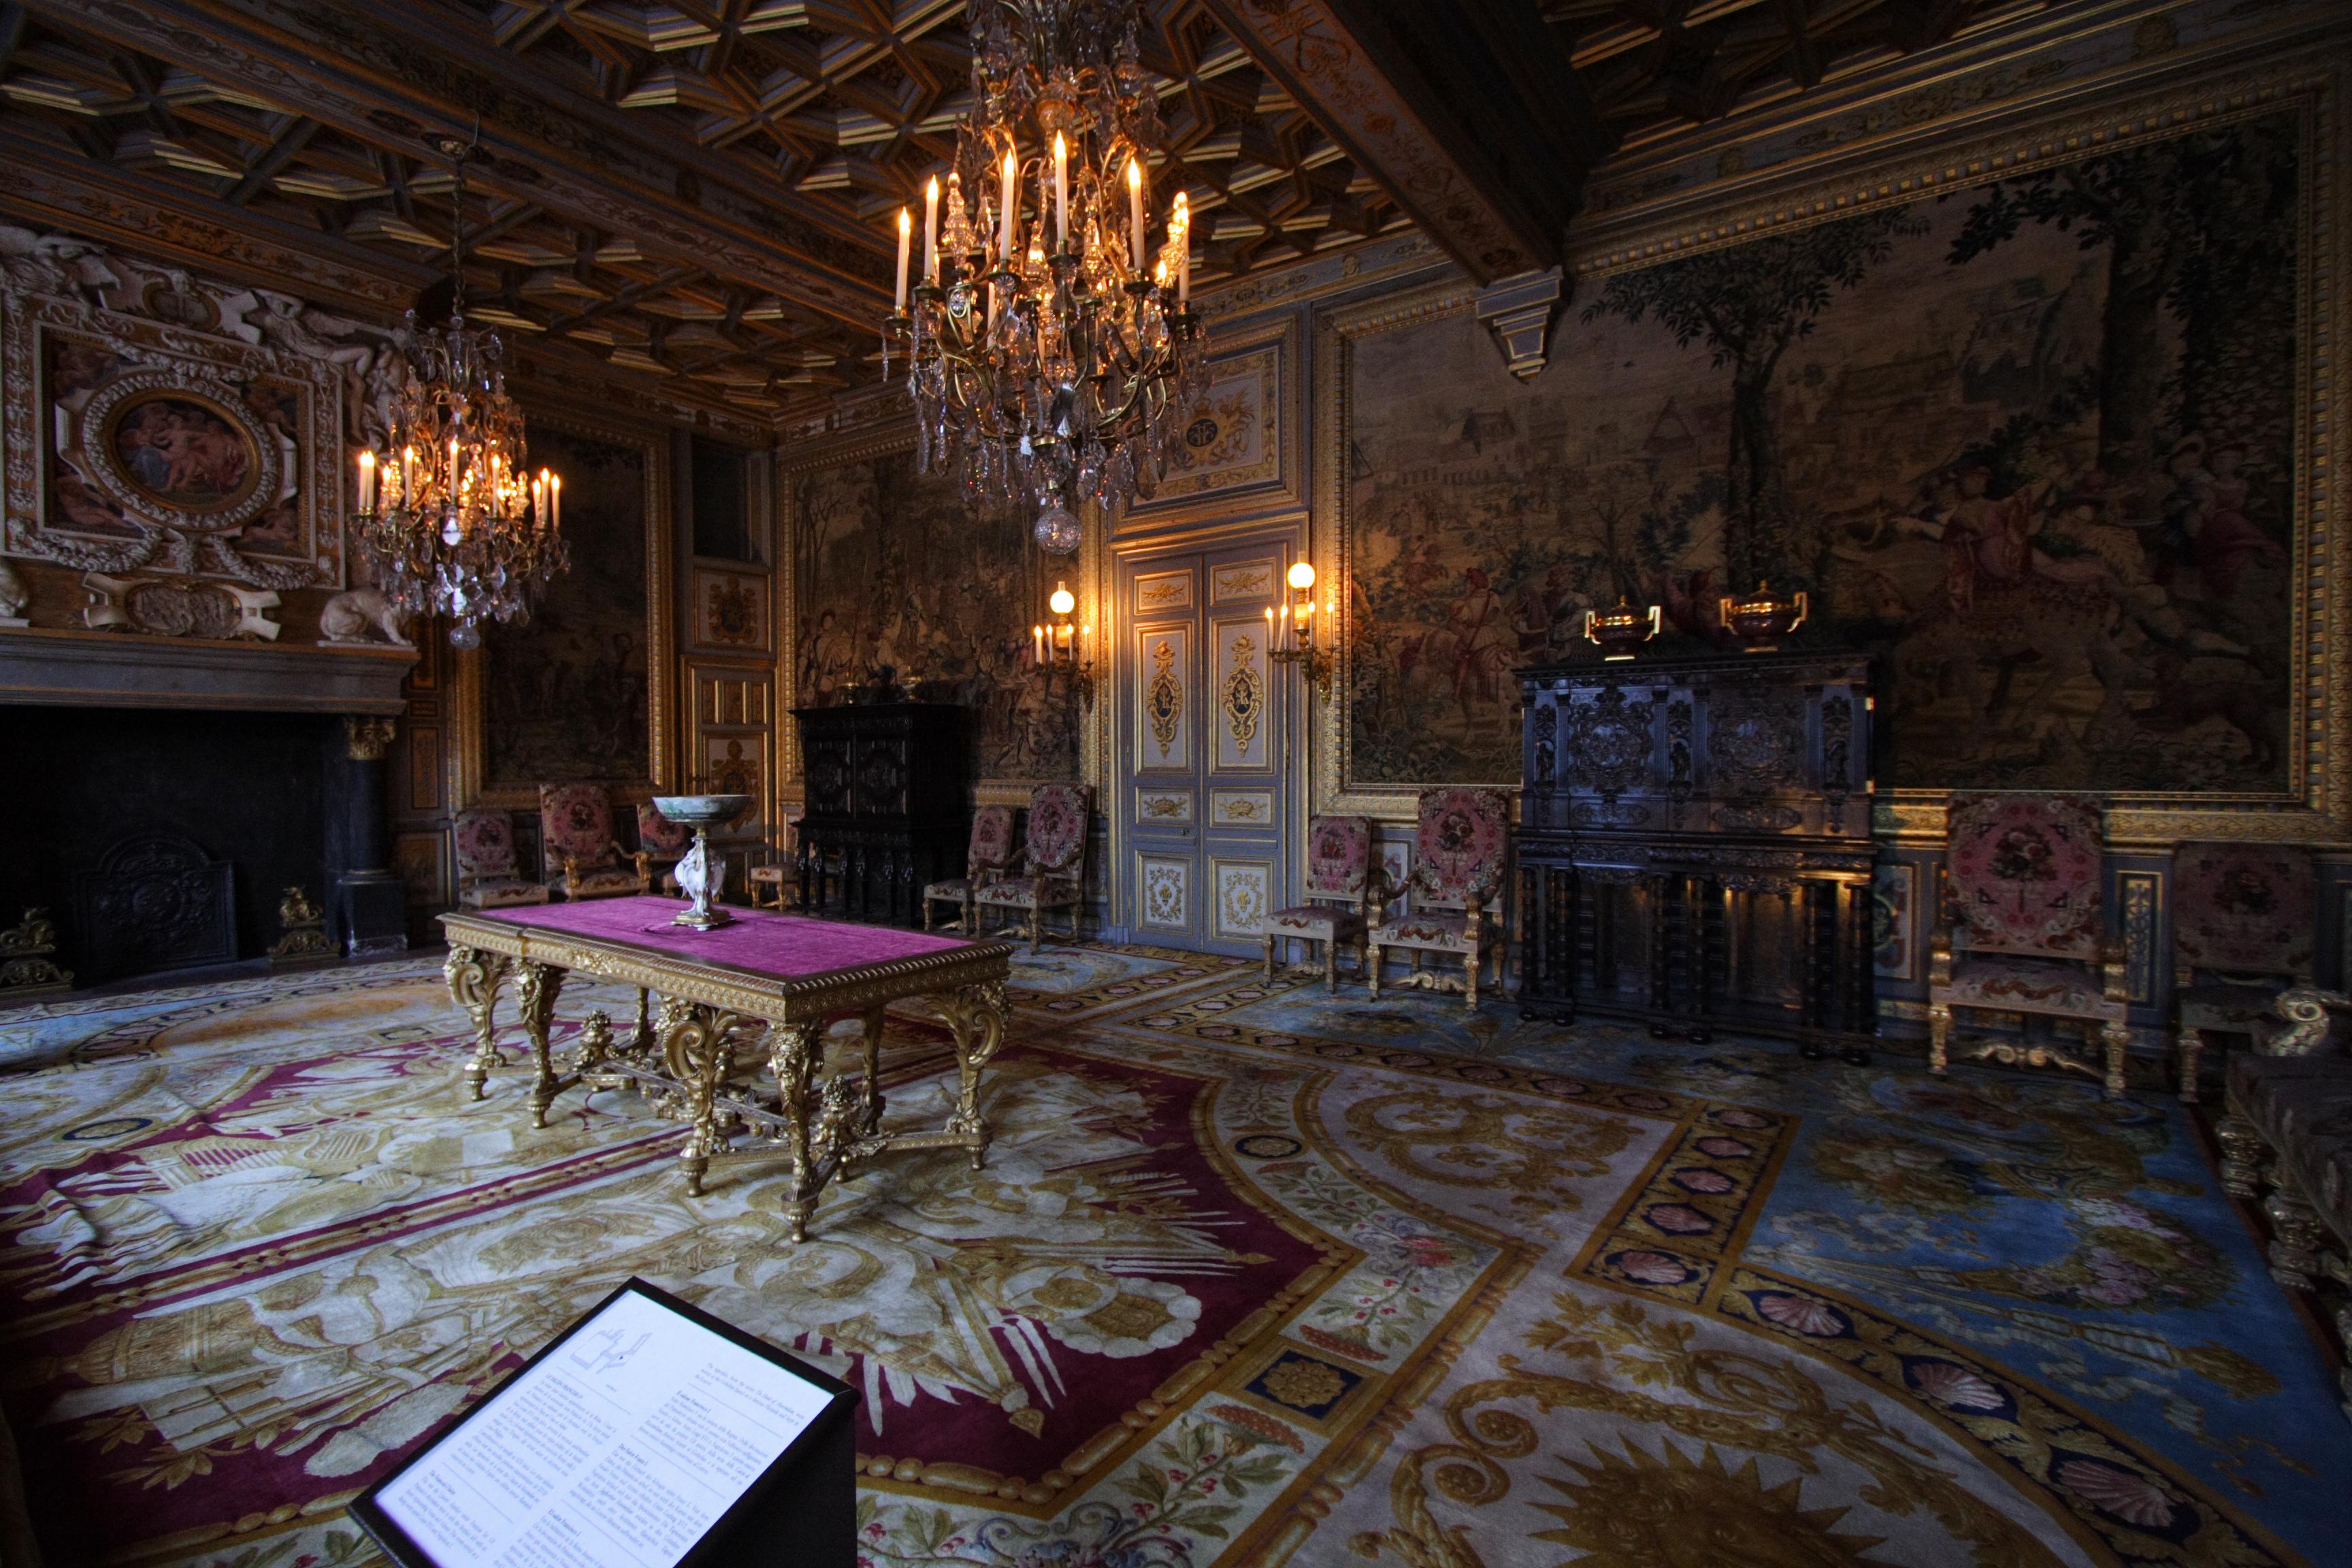 file chateau de fontainebleau fra 022 jpg wikimedia commons. Black Bedroom Furniture Sets. Home Design Ideas